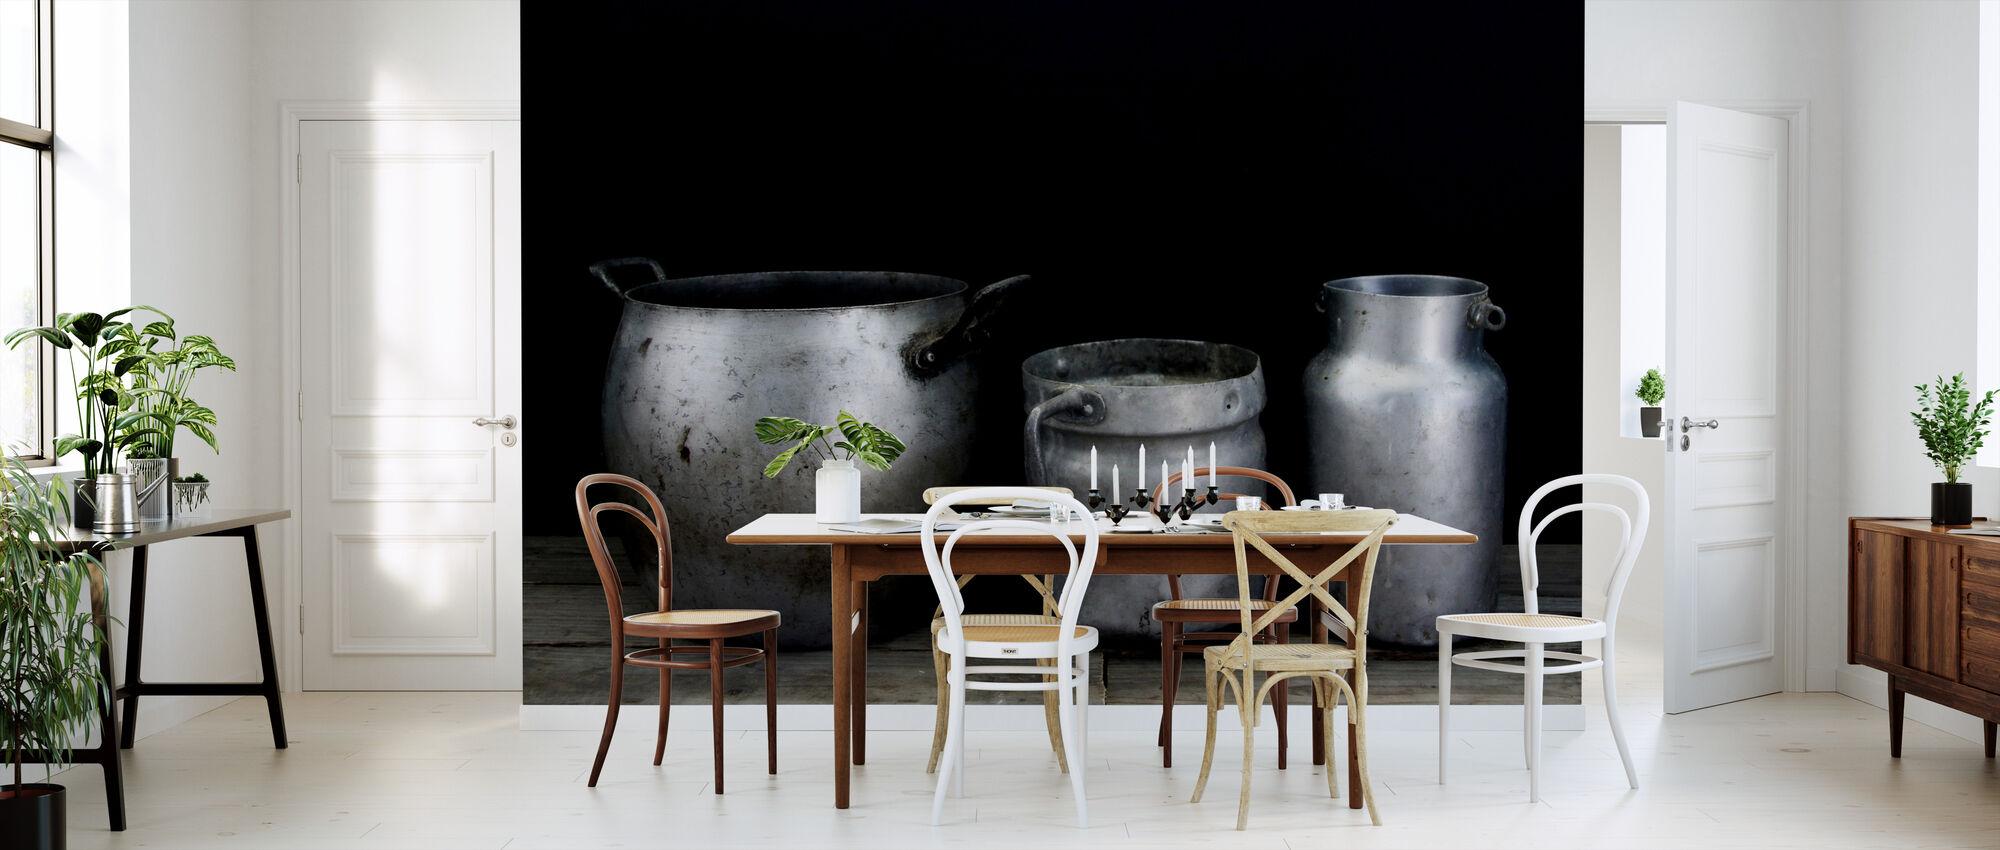 Vintage vessels - Wallpaper - Kitchen